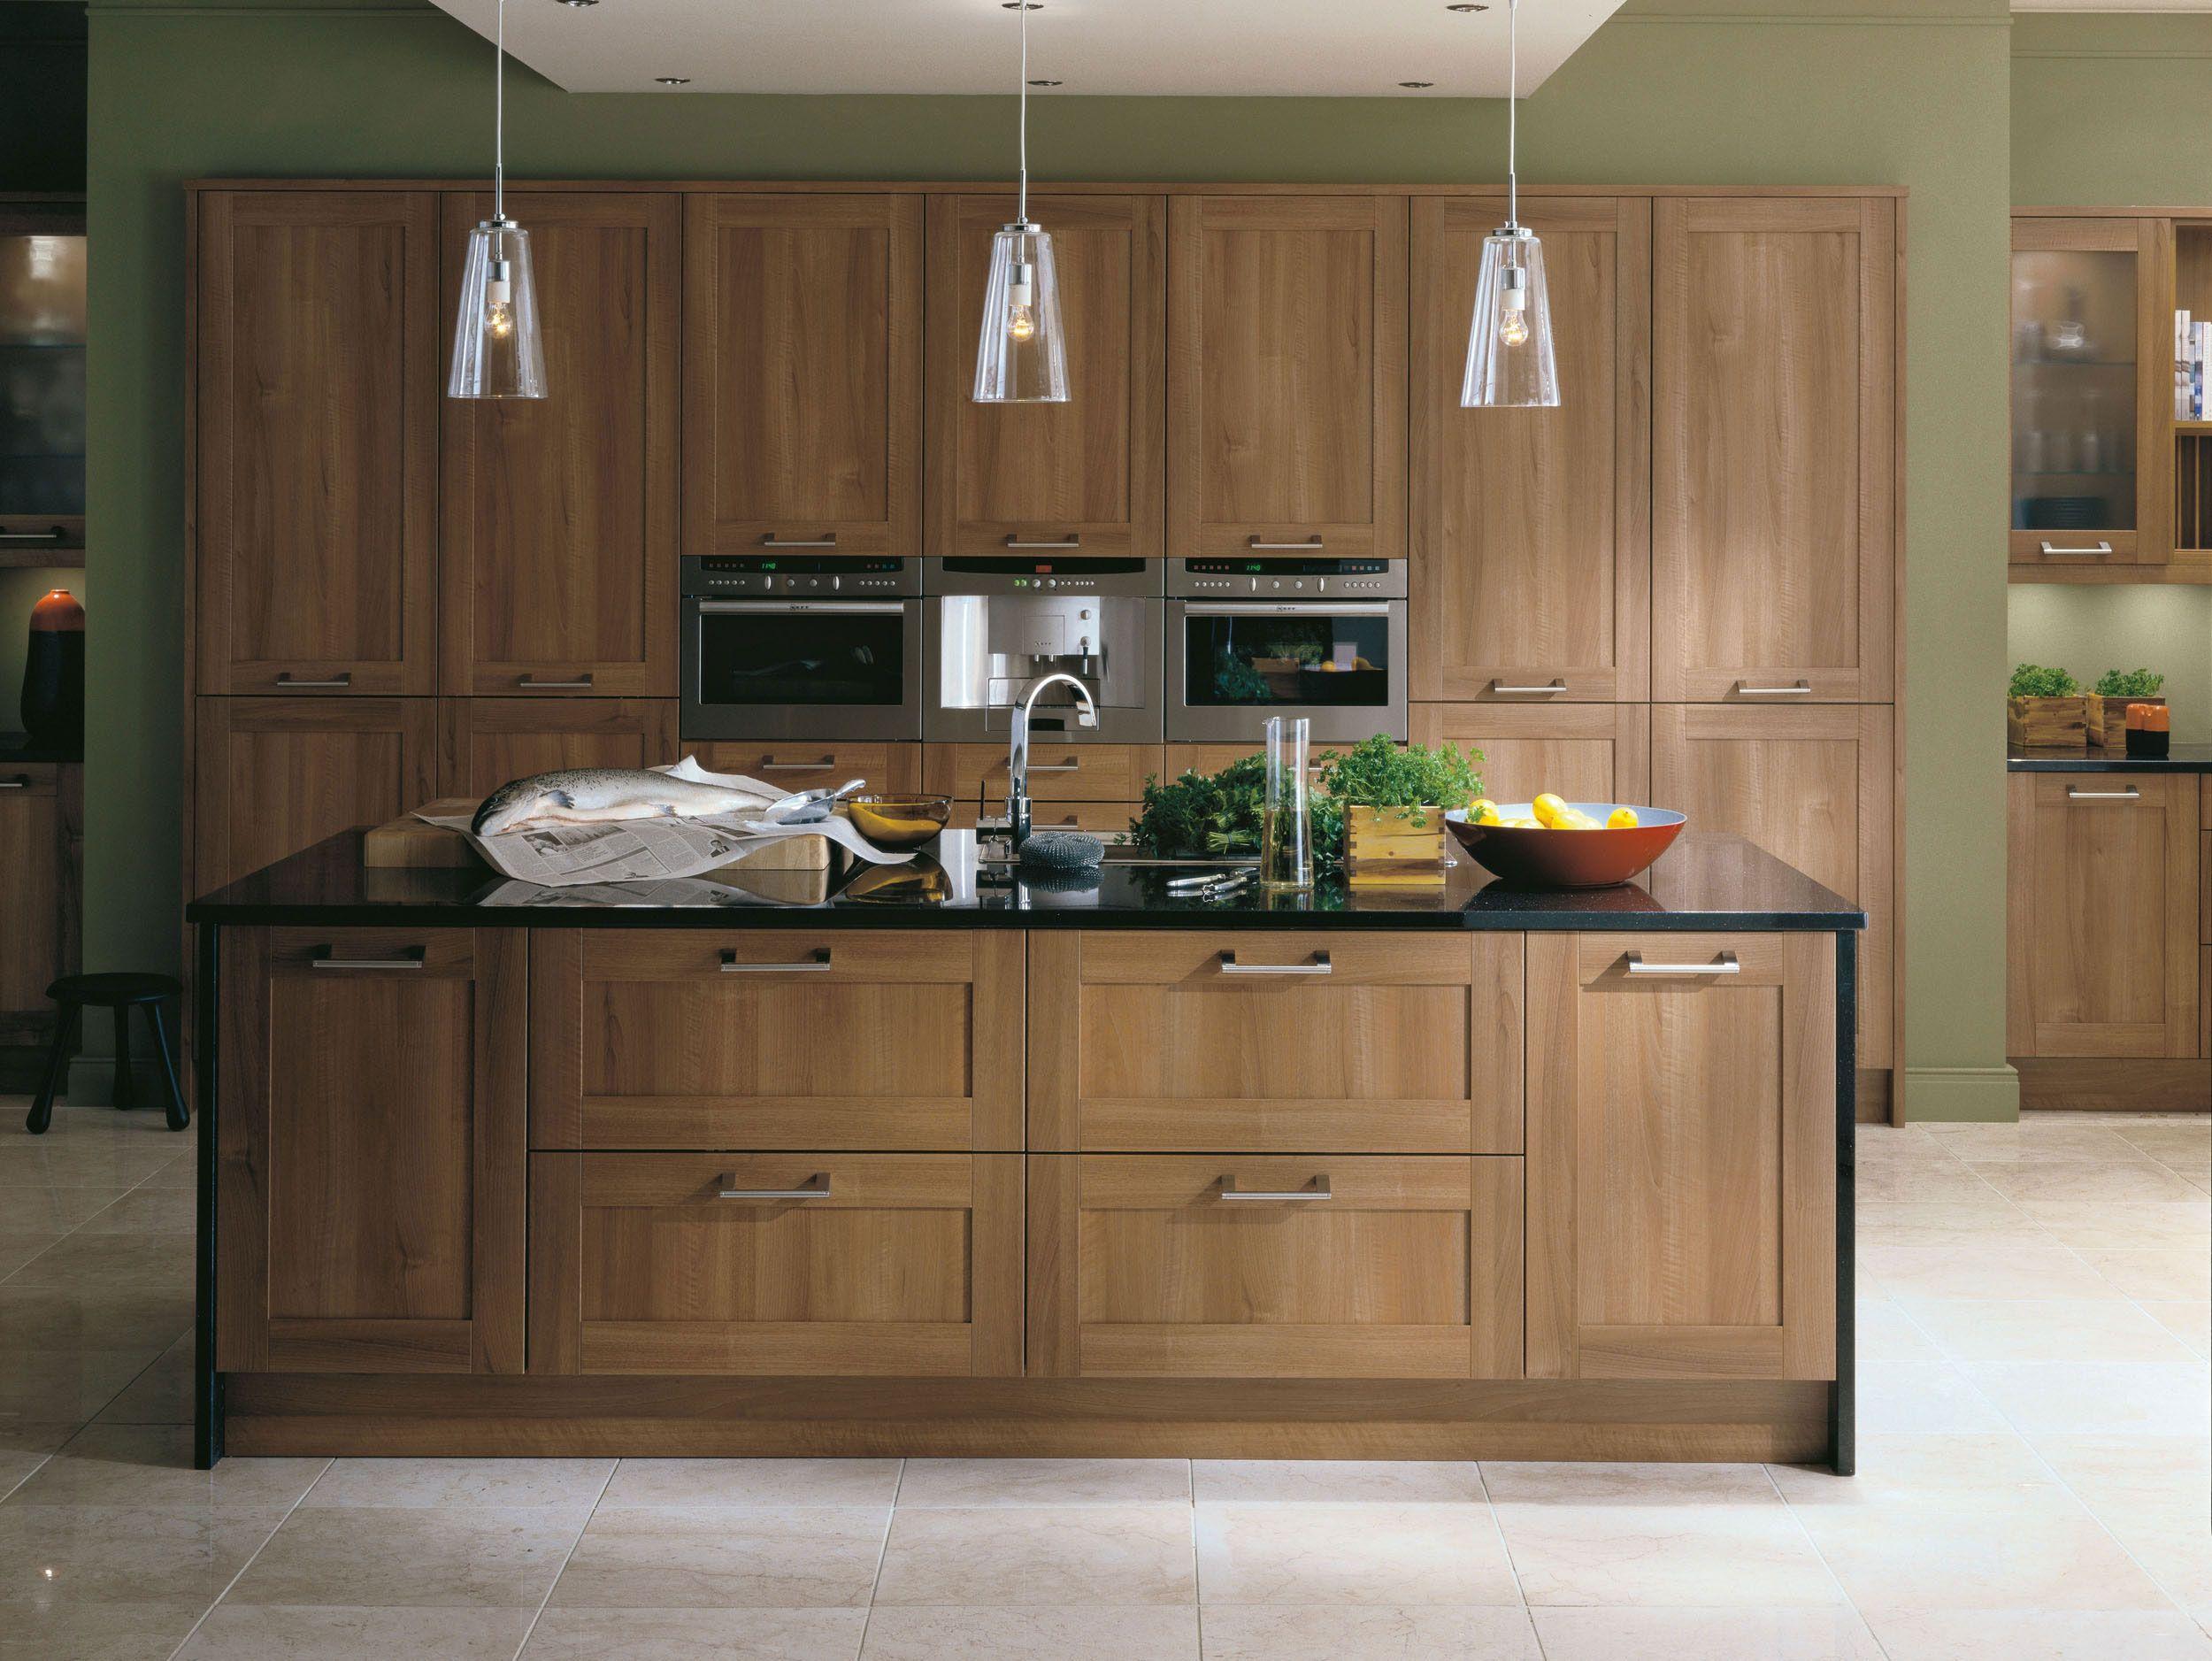 Image Of Walnut Kitchen Cabinet Ideas Walnut Kitchen Cabinets